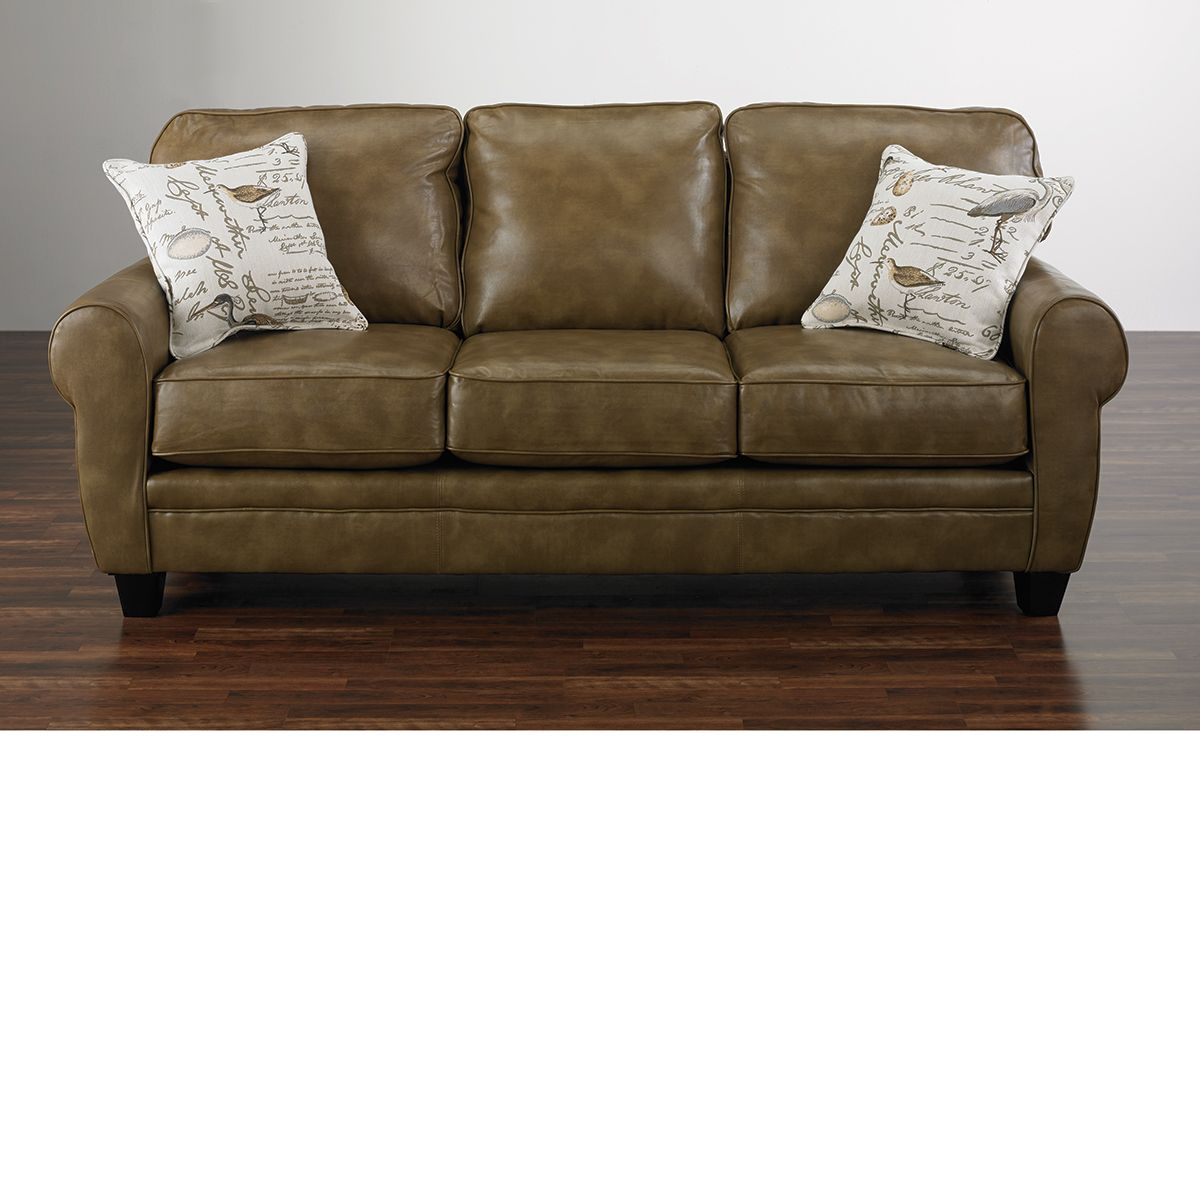 Handmade Leather Sofa: The Dump Furniture - Handmade Leather Sofa